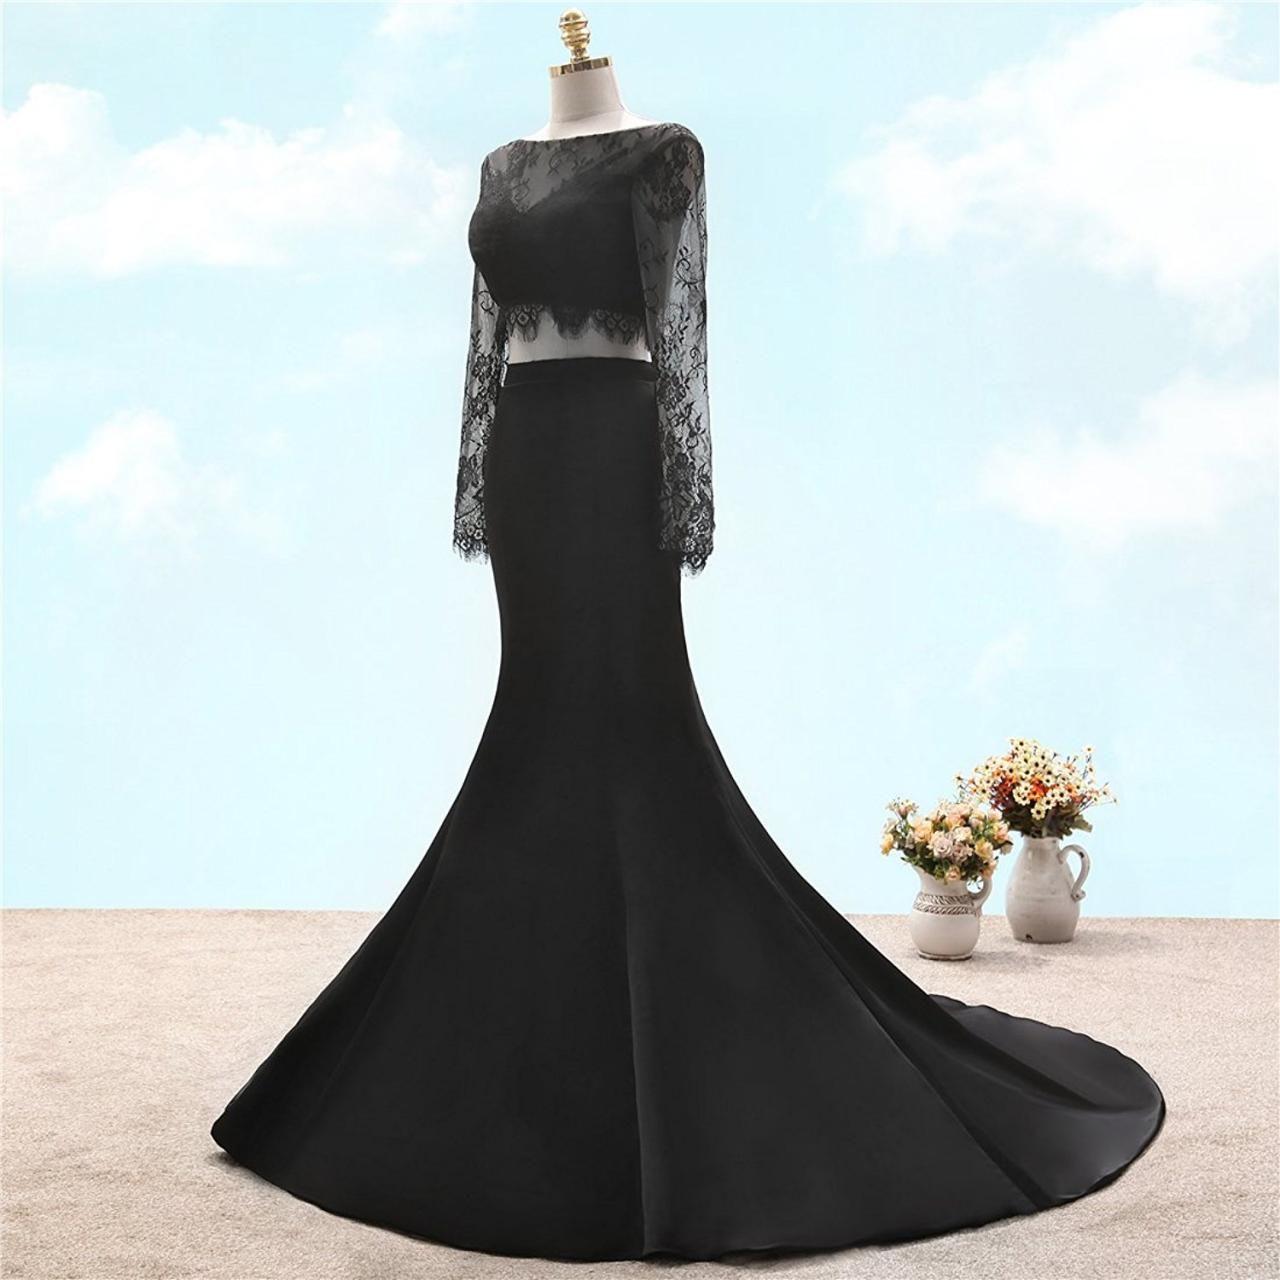 Womenus trumpet vback long sleeves black lace twopiece satin prom